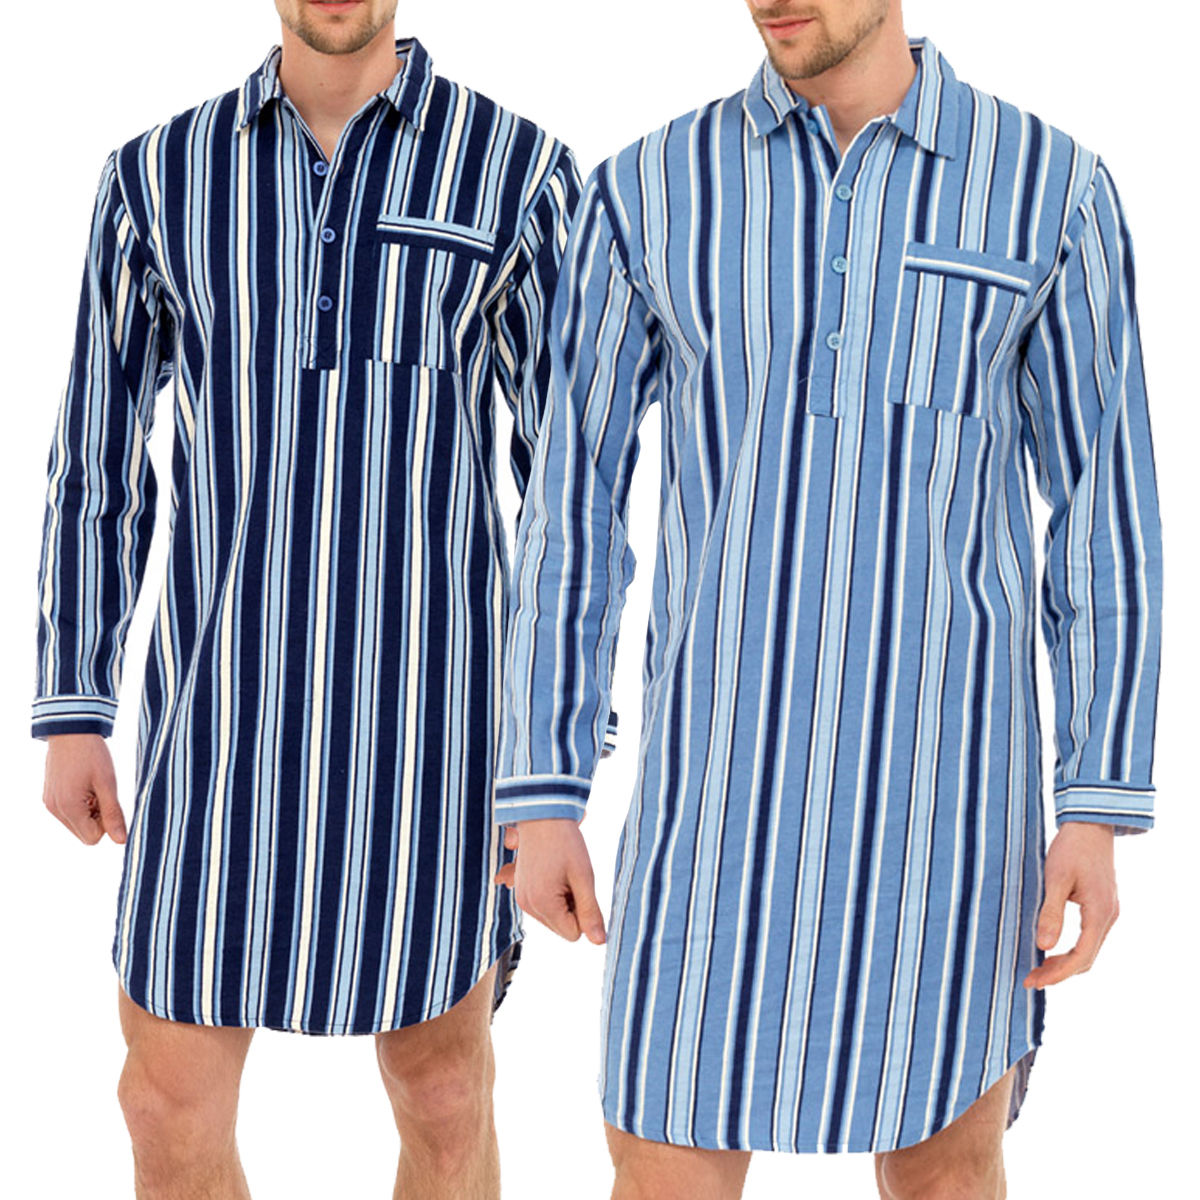 Mens traditional nightshirt flannel pj pyjama night shirt for Womens flannel night shirts